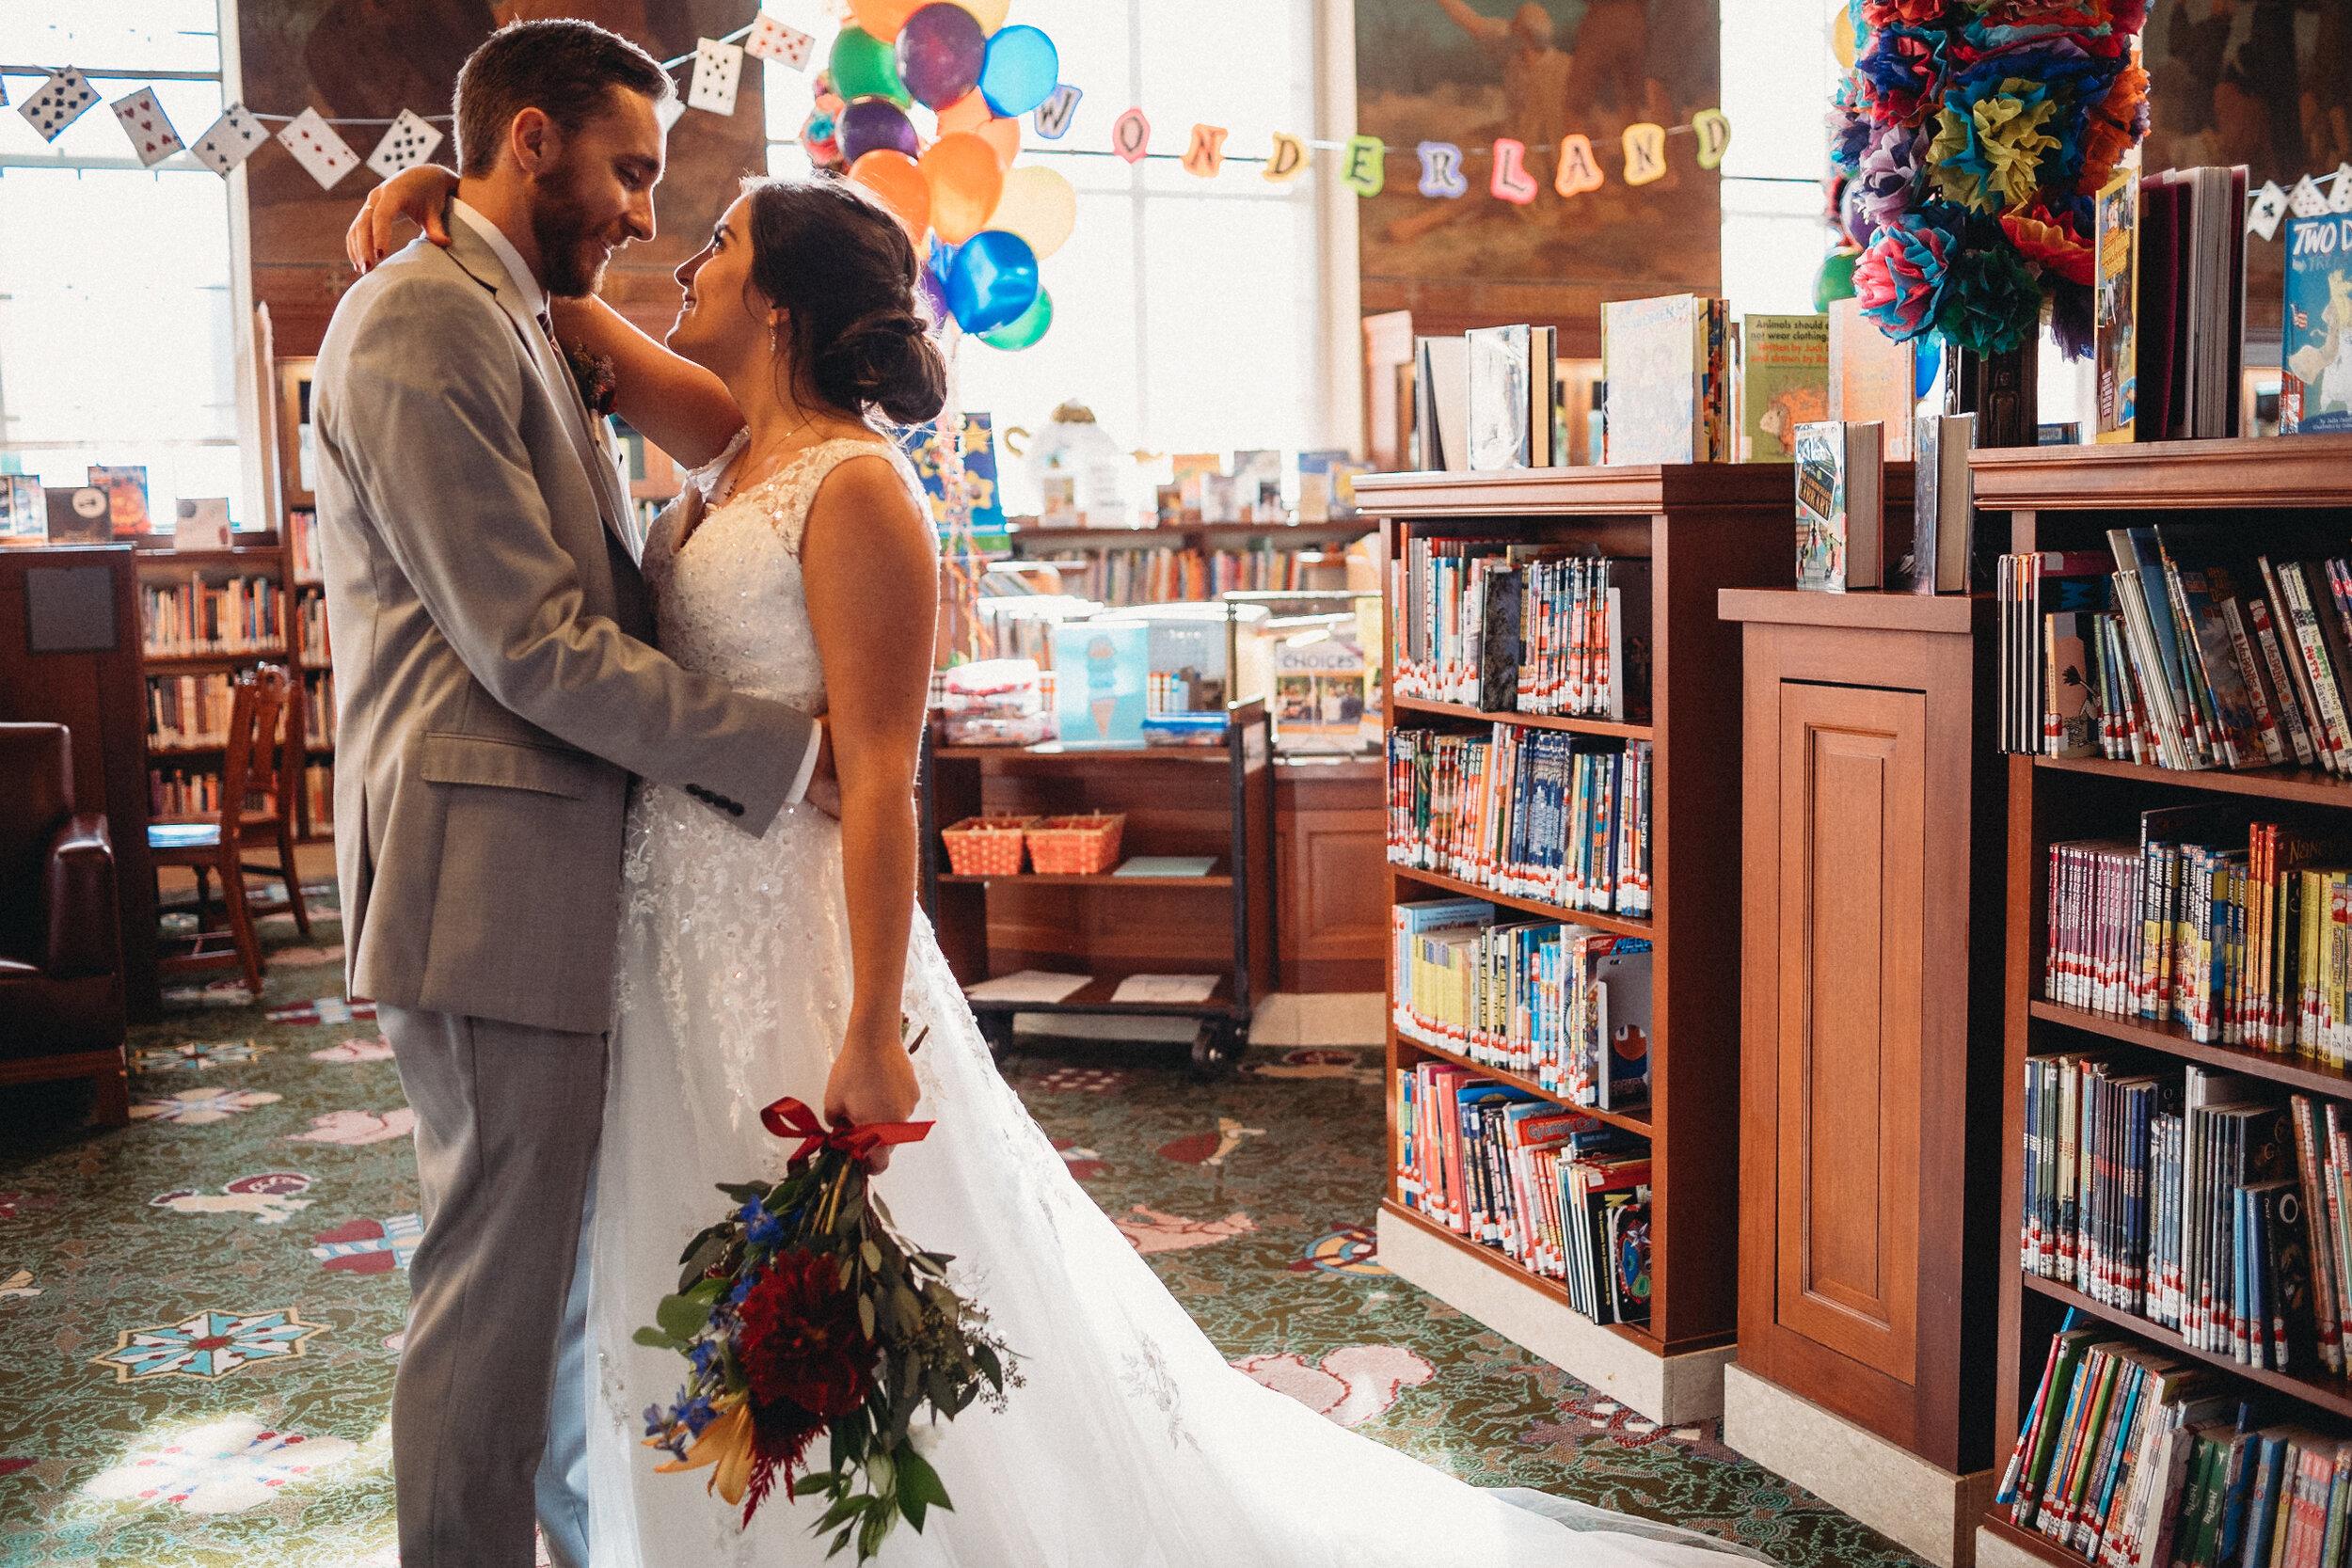 dtla-central-library-wedding-rebeccaylasotras-10.jpg